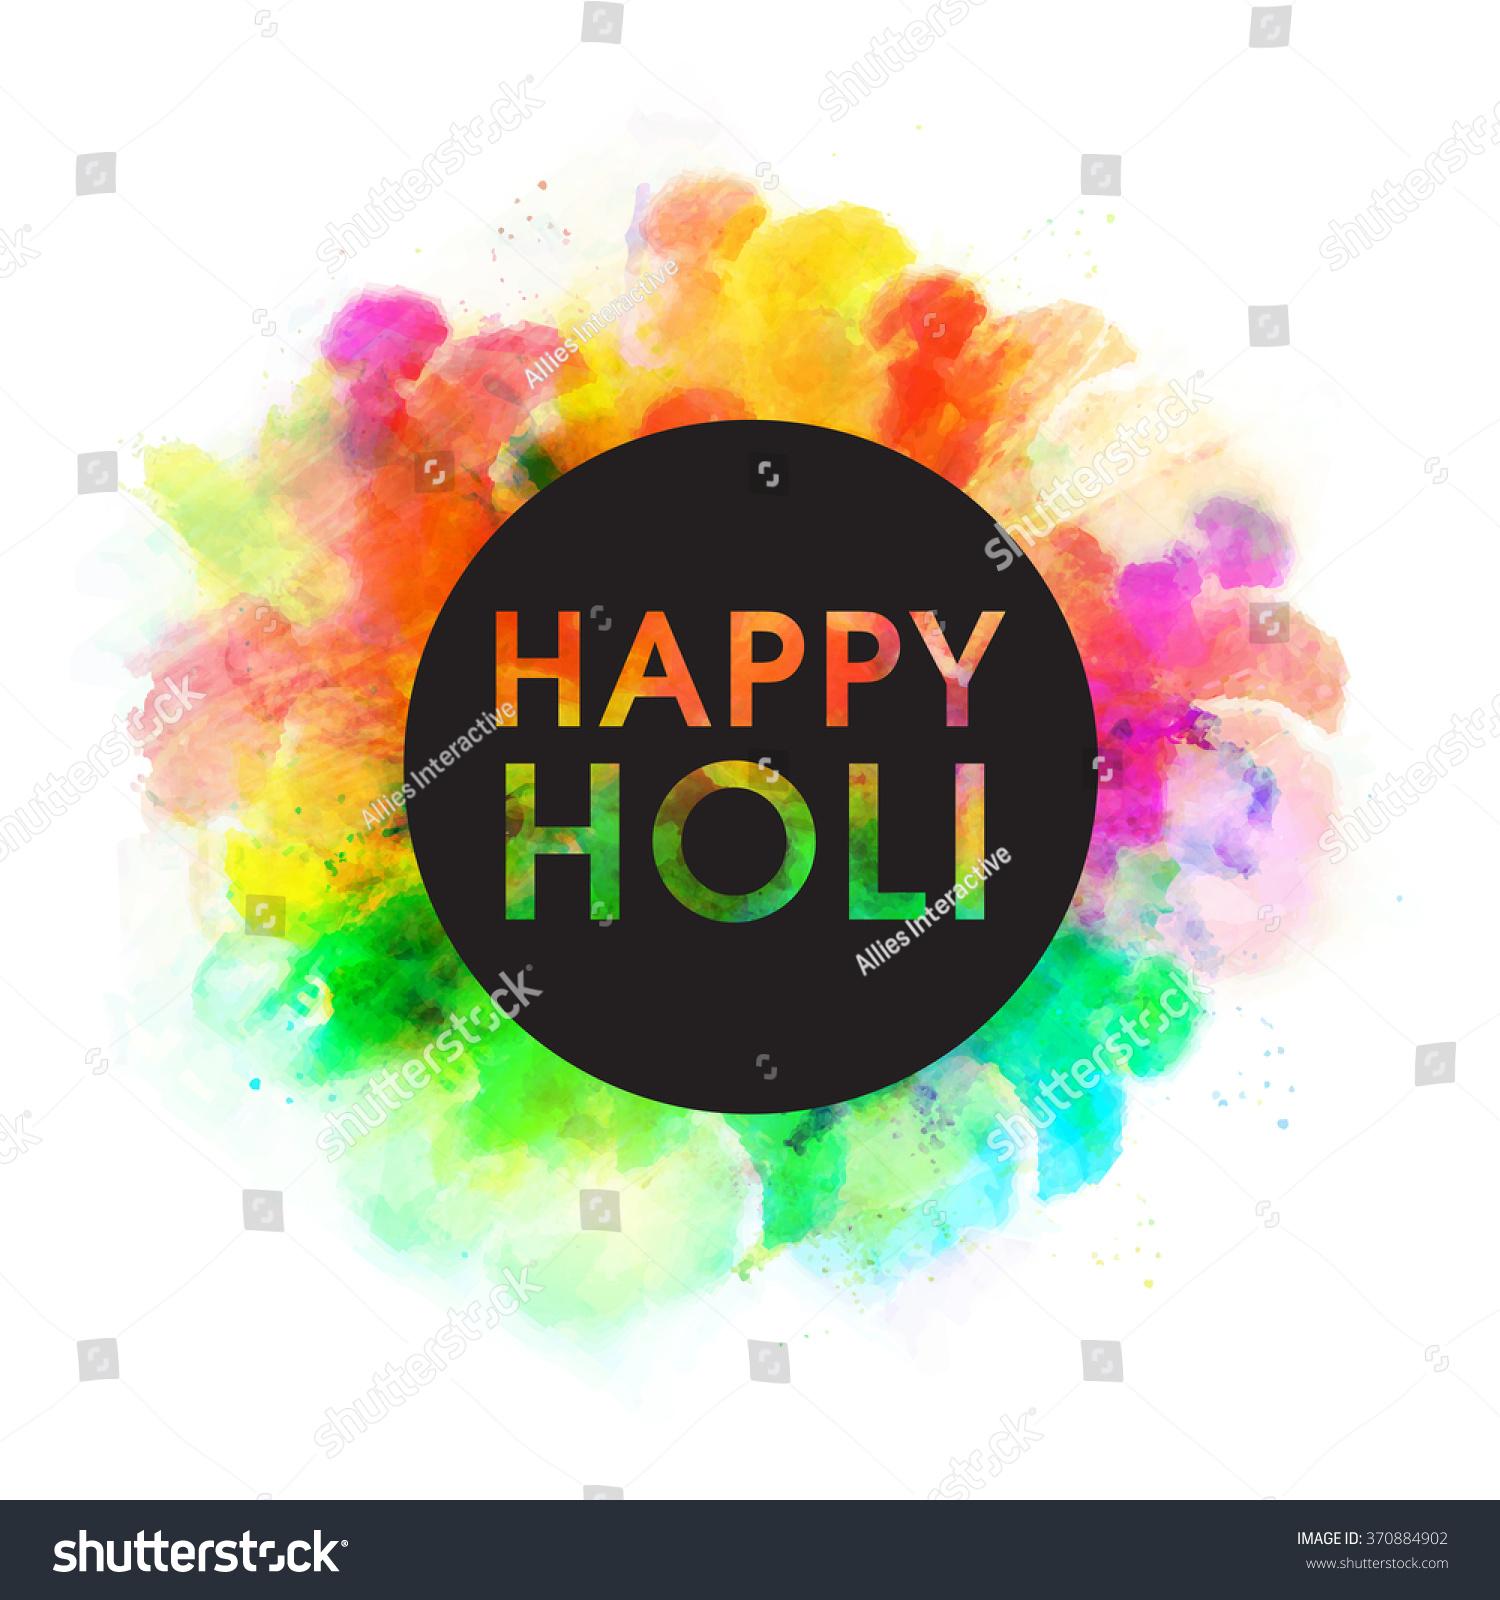 stylish text happy holi on colourful stock vector 370884902